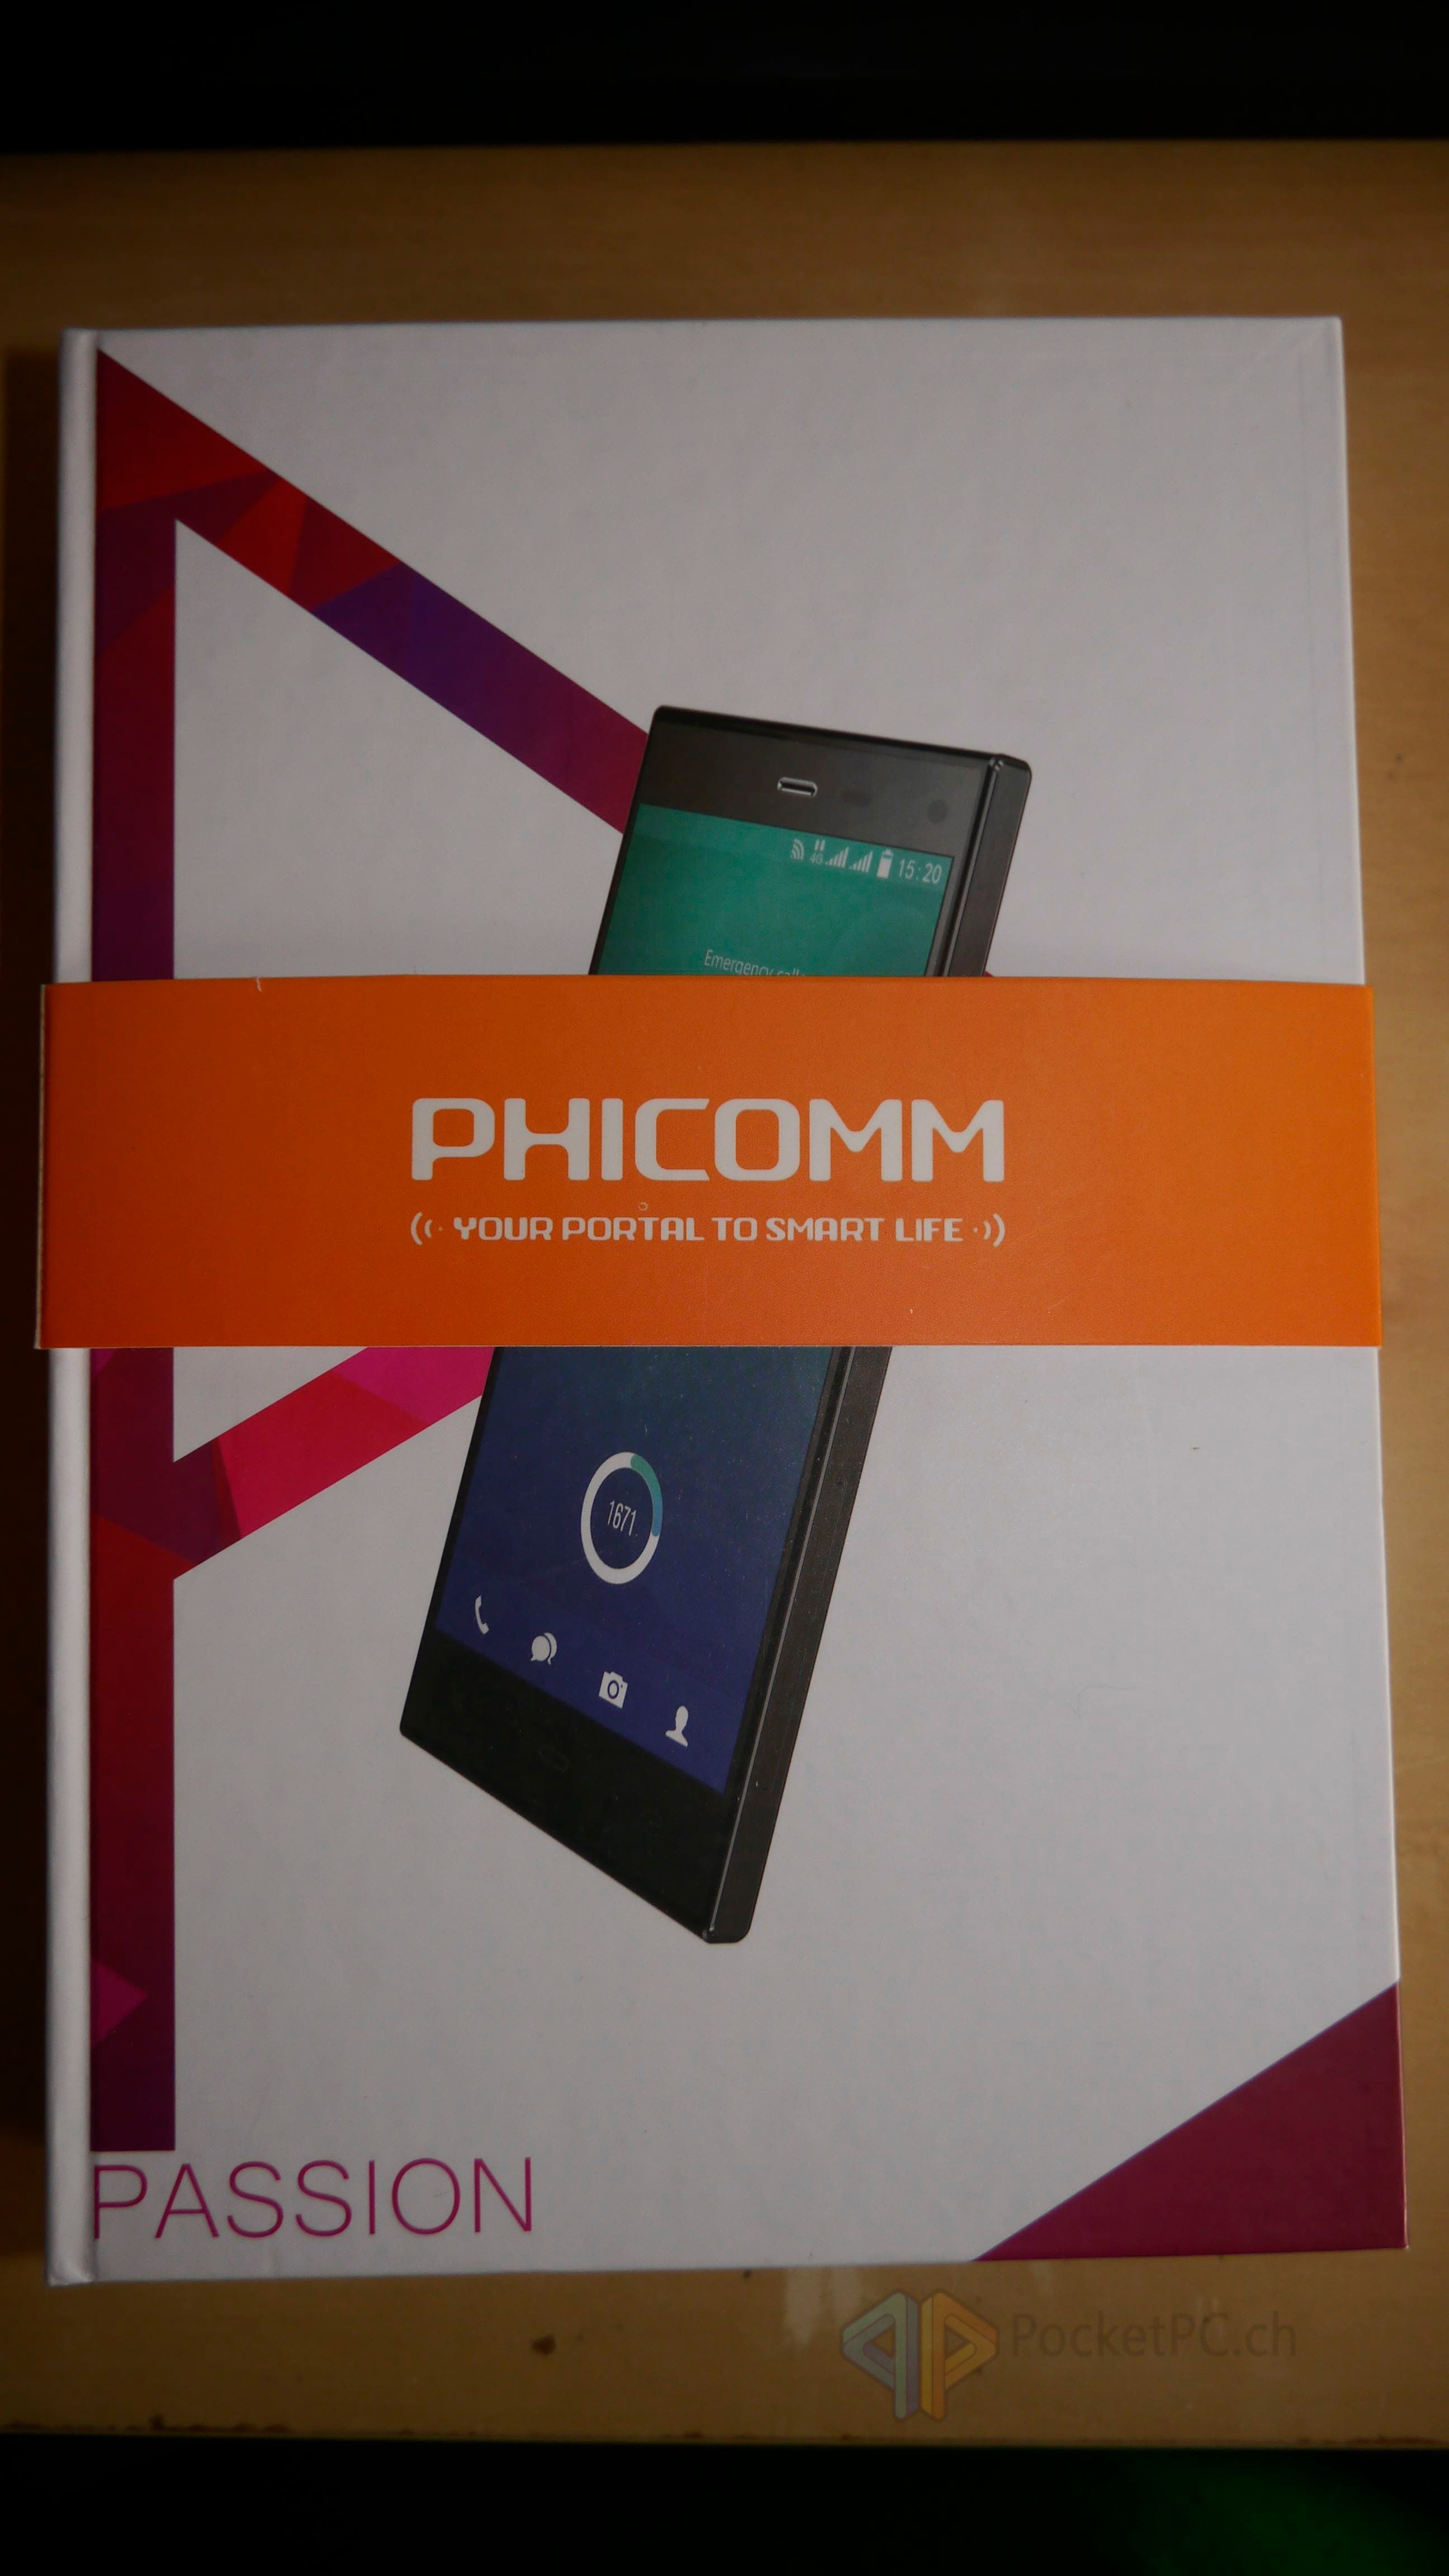 Phicomm-Passion-Gerät-ausgepackt-1 Review: Phicomm Passion im Test